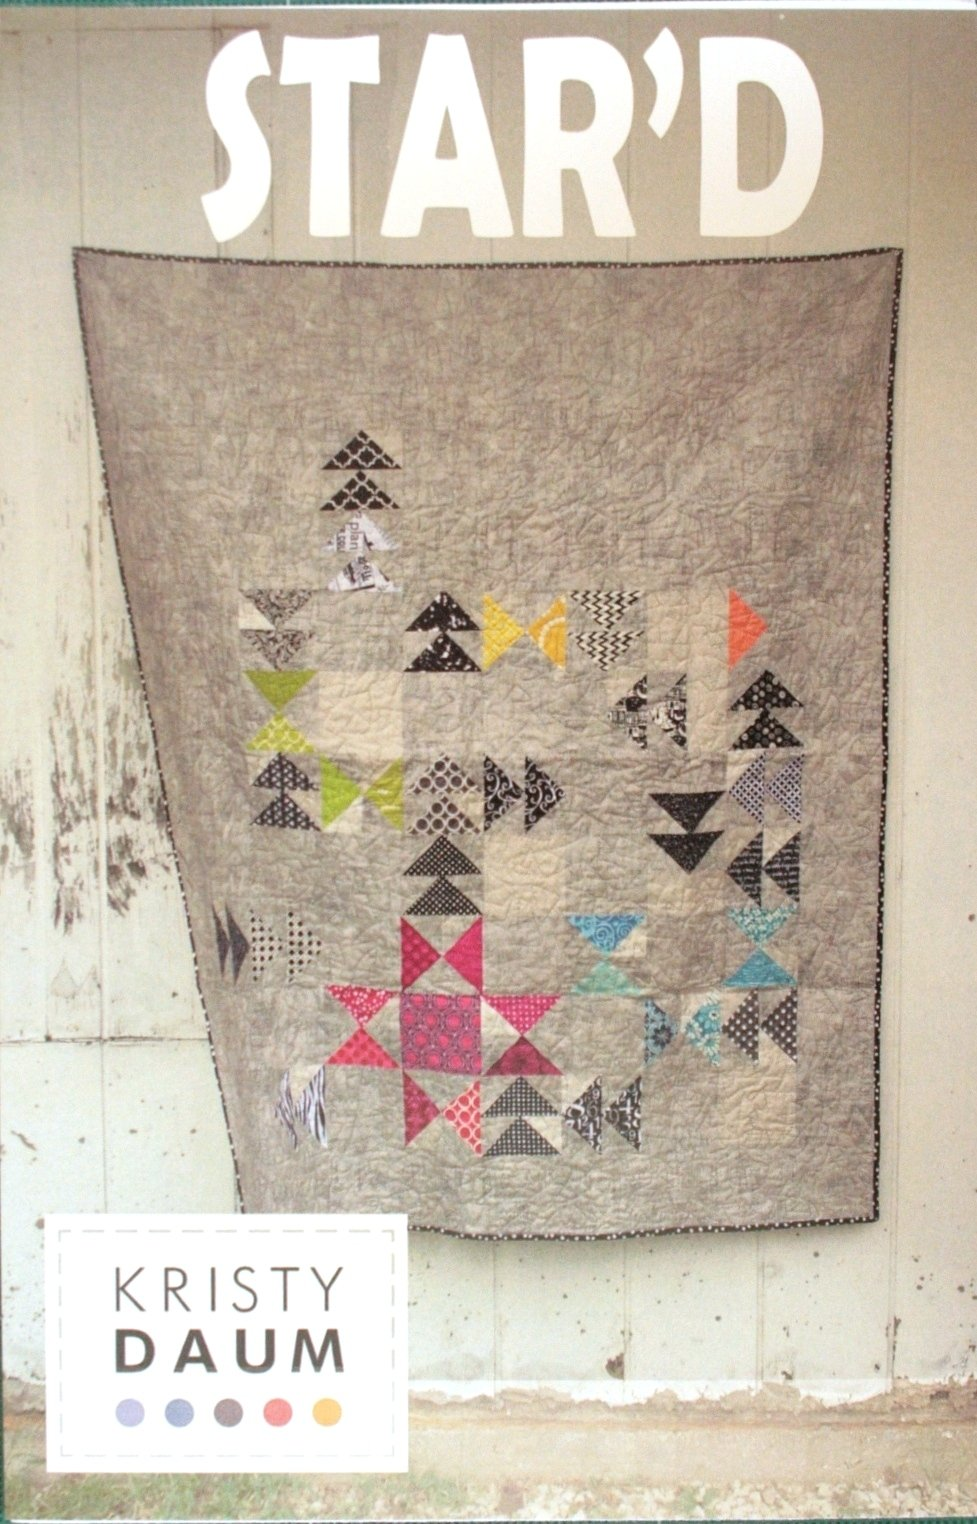 Kristy Daum St. Louis Folk Victorian Star'd quilt pattern